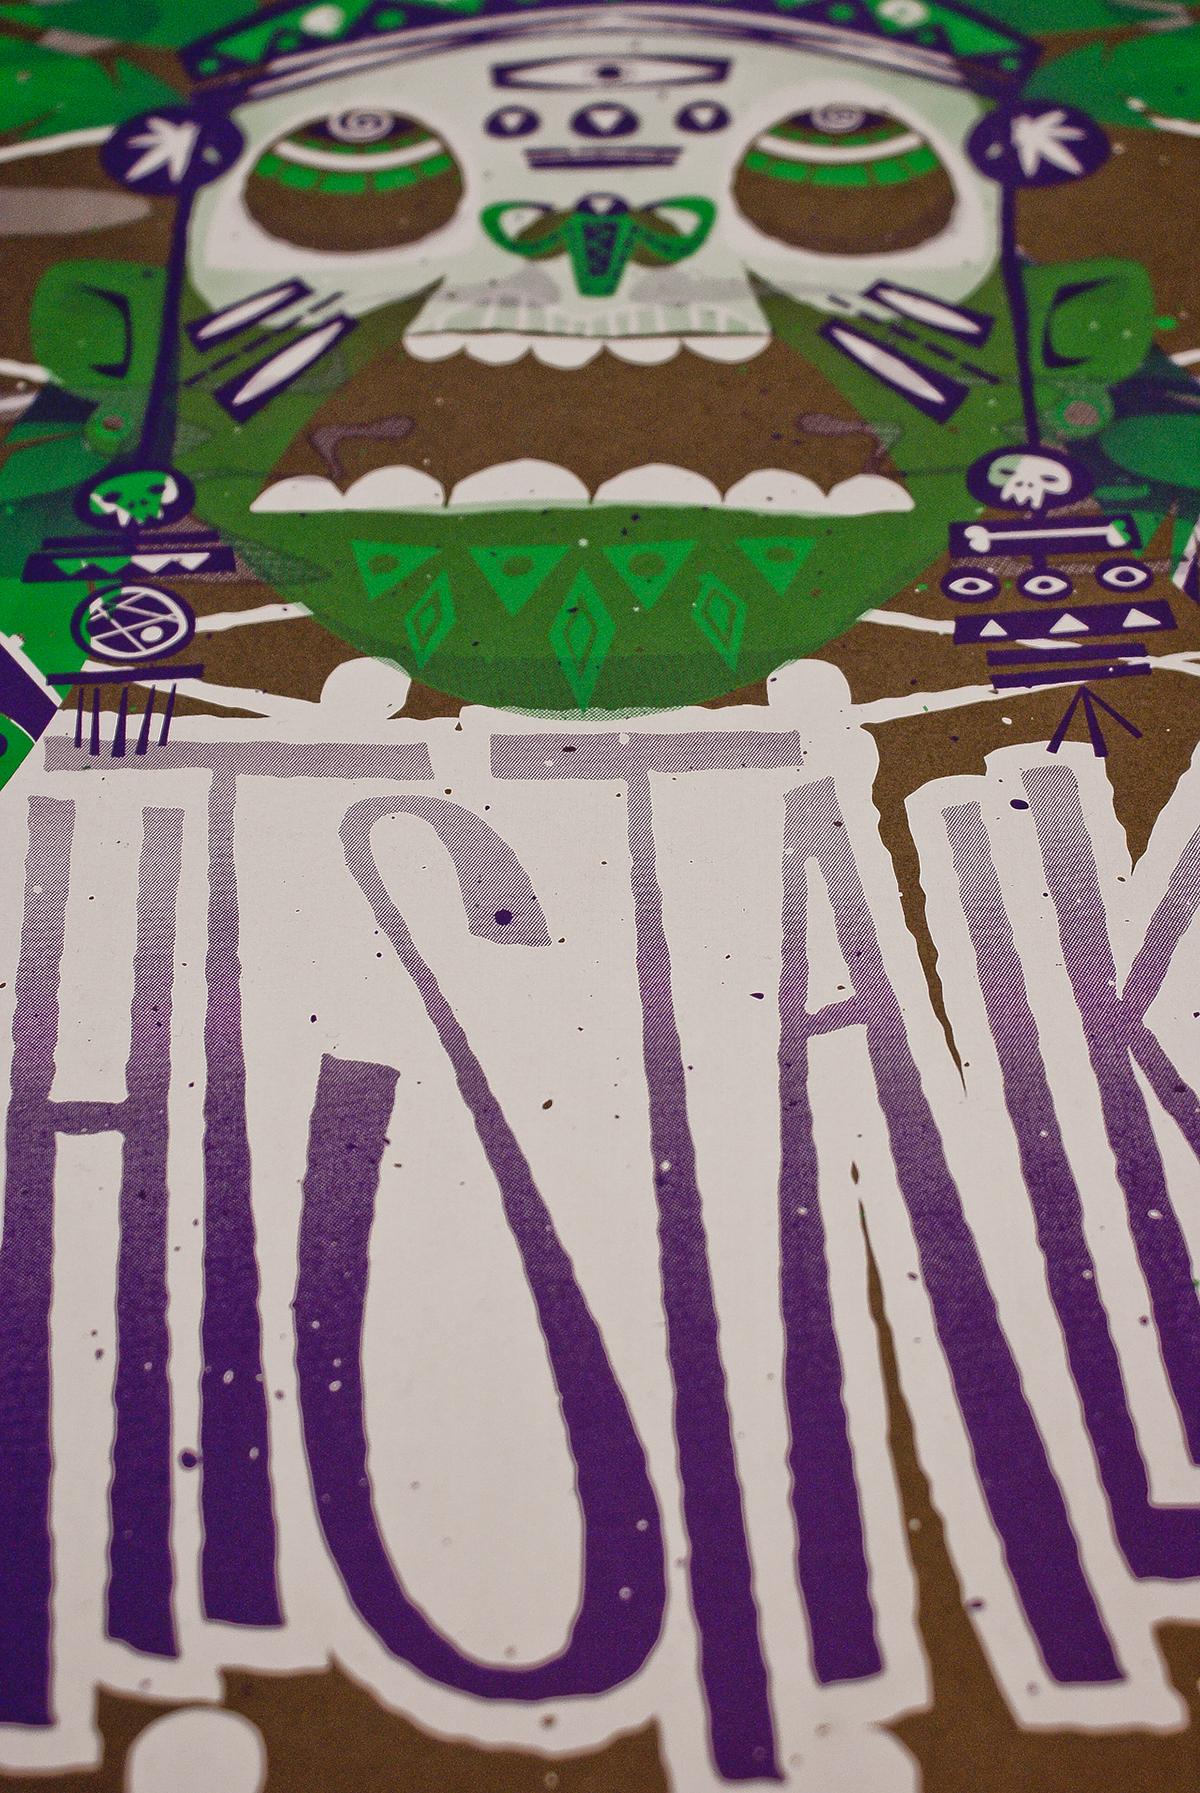 silkcreen handmade gig poster nightstalker   fuzztastic planet ink+destroy fuzzink φυγιαποδωρεκωλλοπαιδο while I was getting high